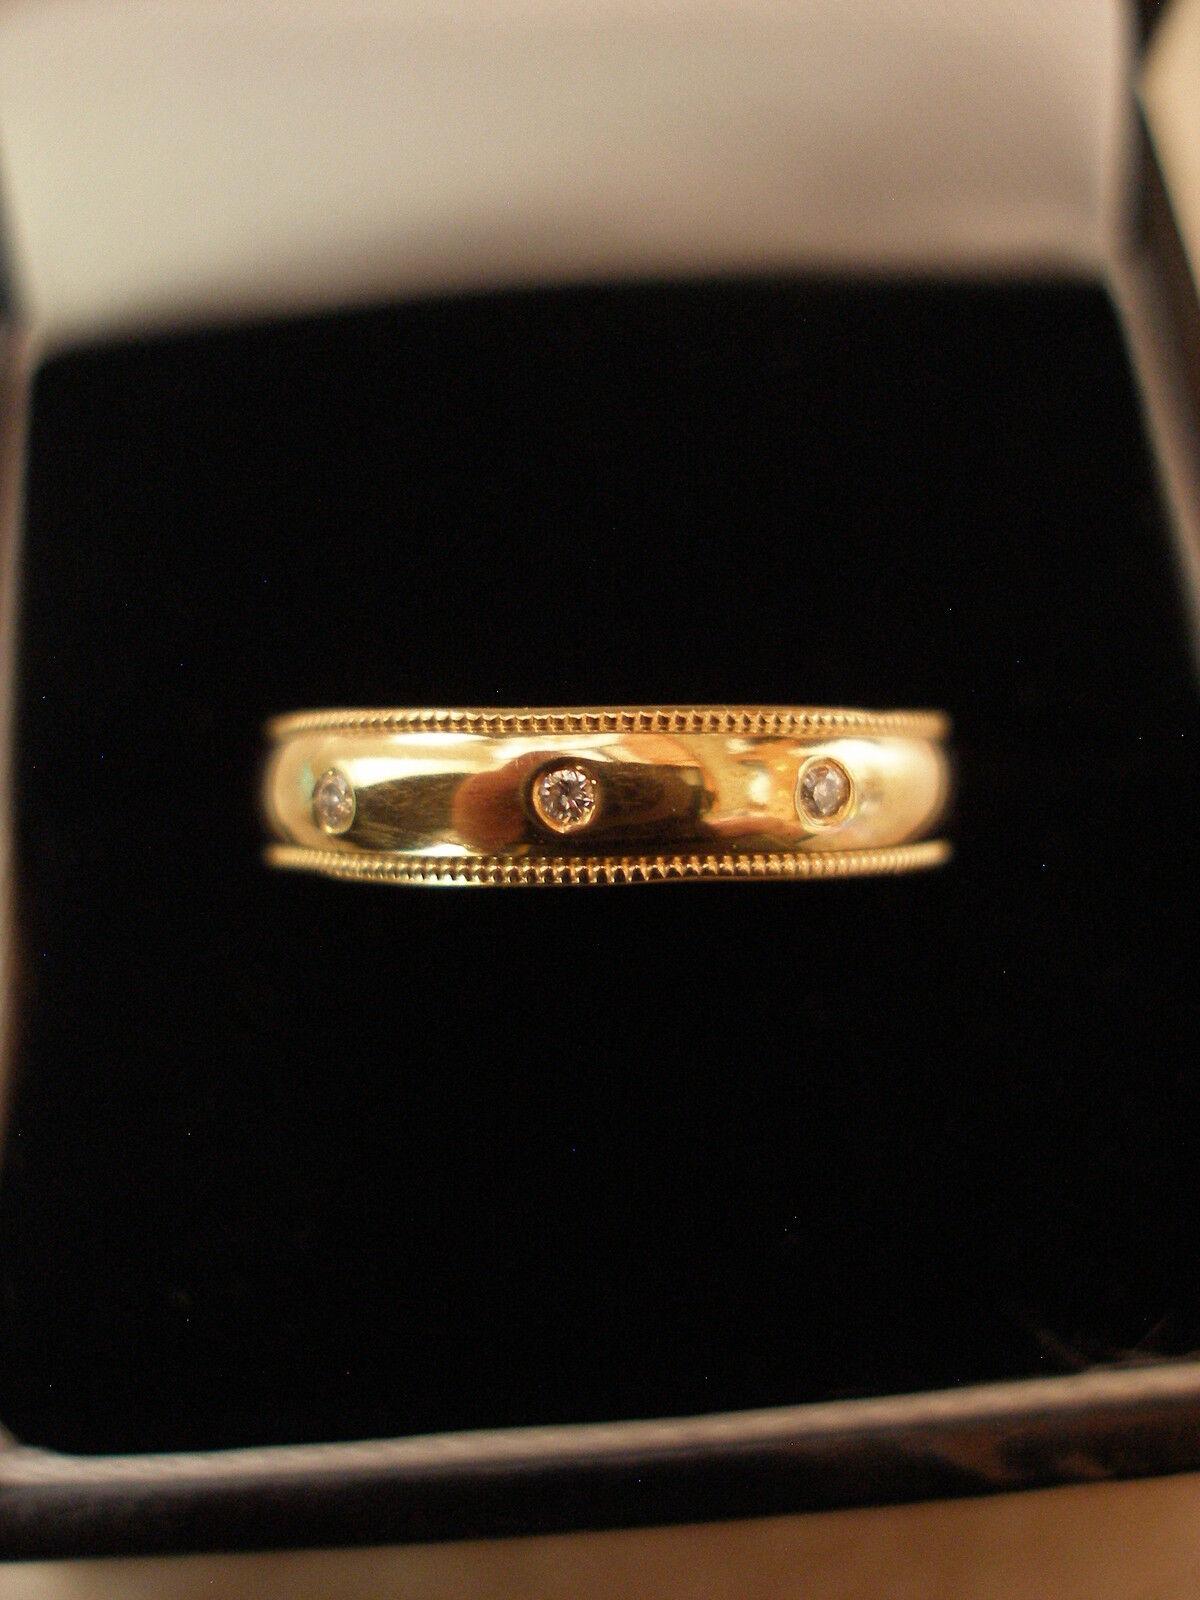 9 CARAT YELLOW gold DIAMOND SET WEDDING RING BRAND NEW IN BOX MADE IN ENGLAND